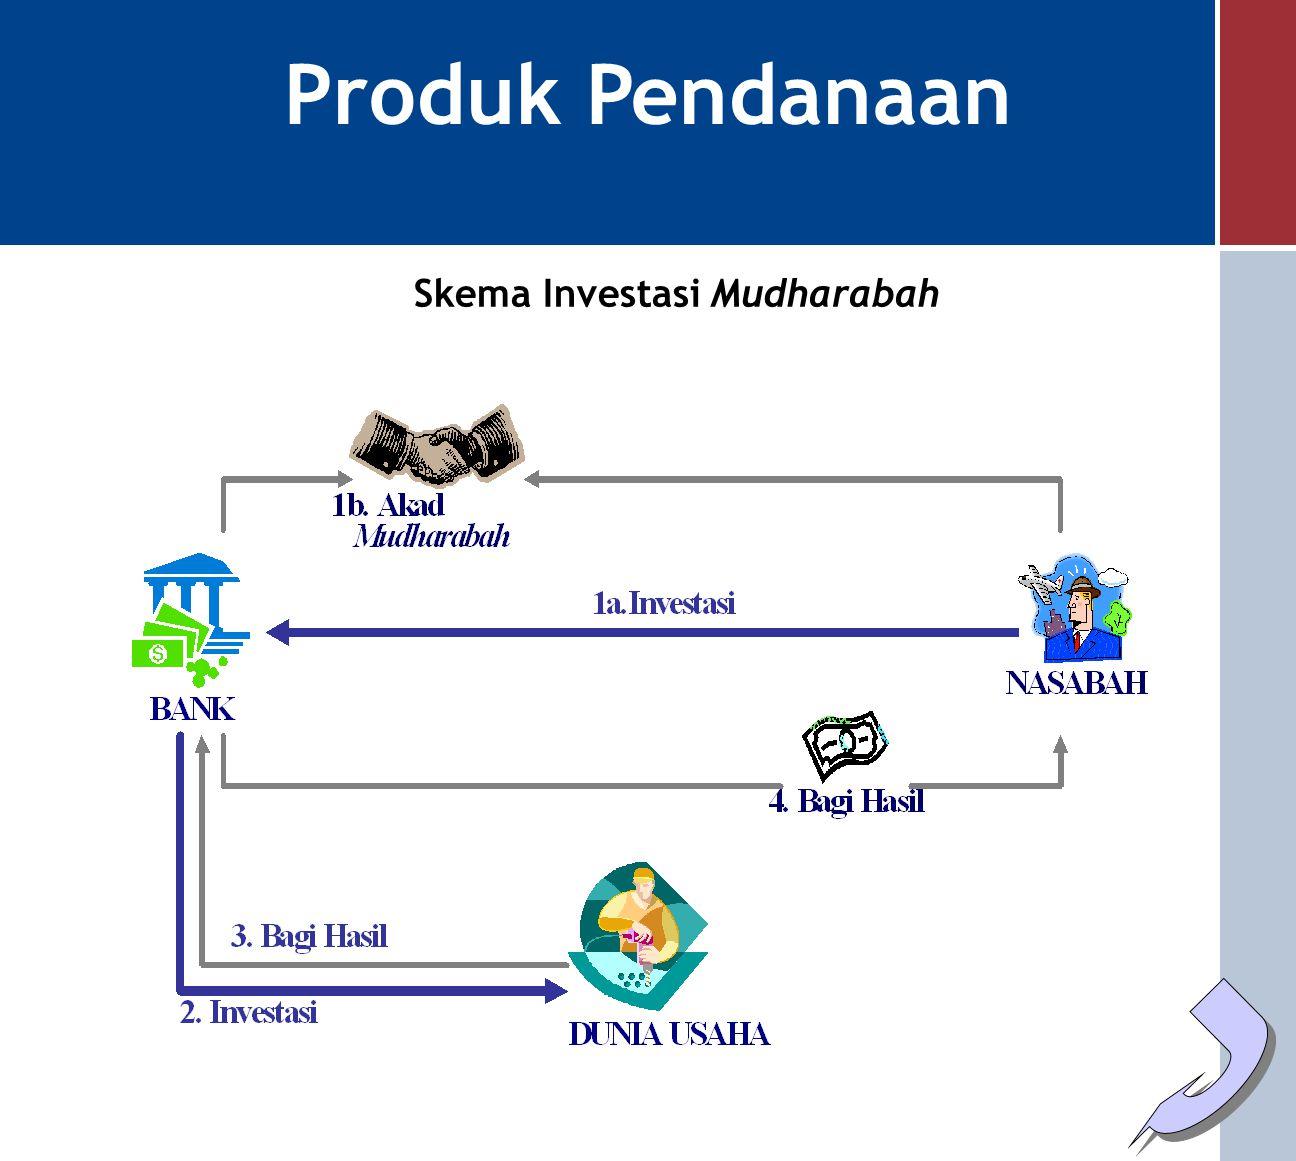 Produk Pendanaan Skema Investasi Mudharabah